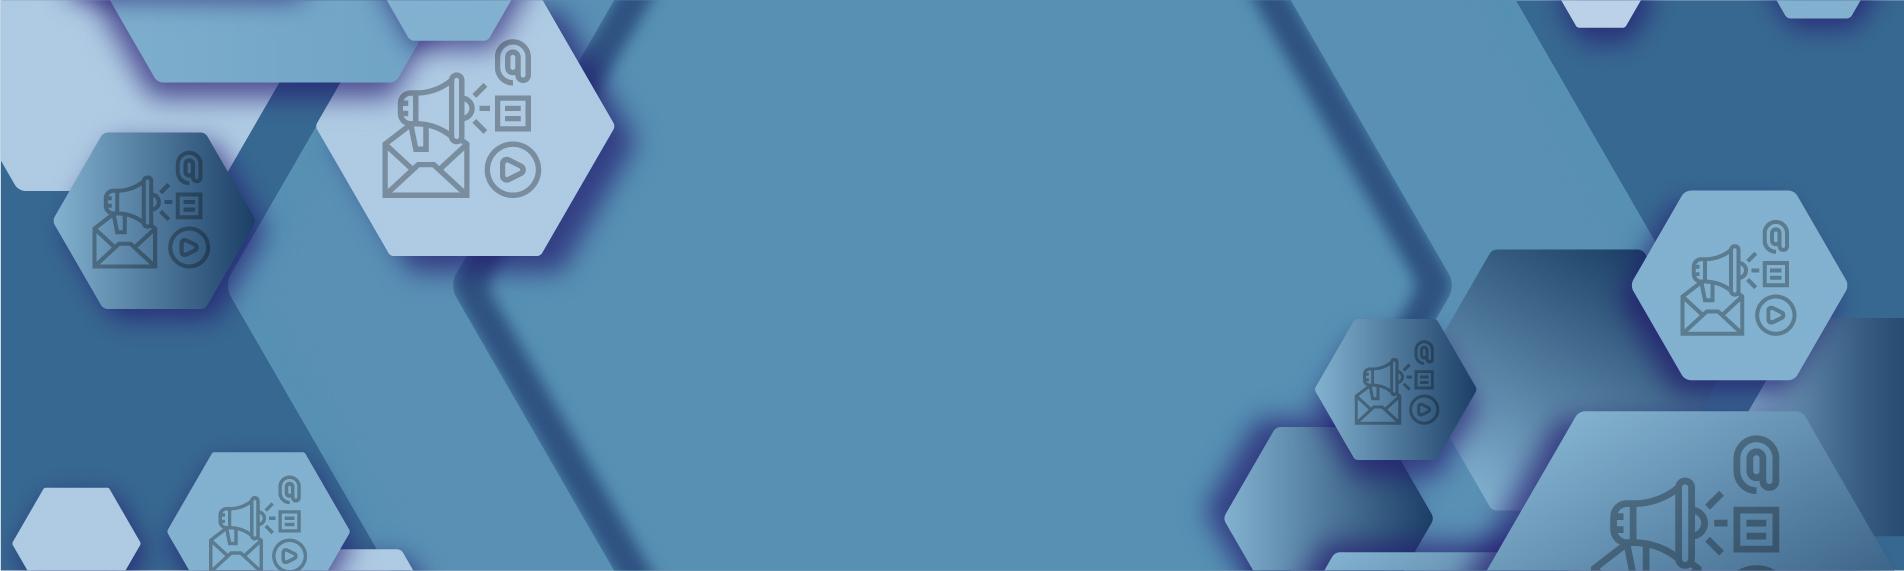 Digital Marketing Blog Cover